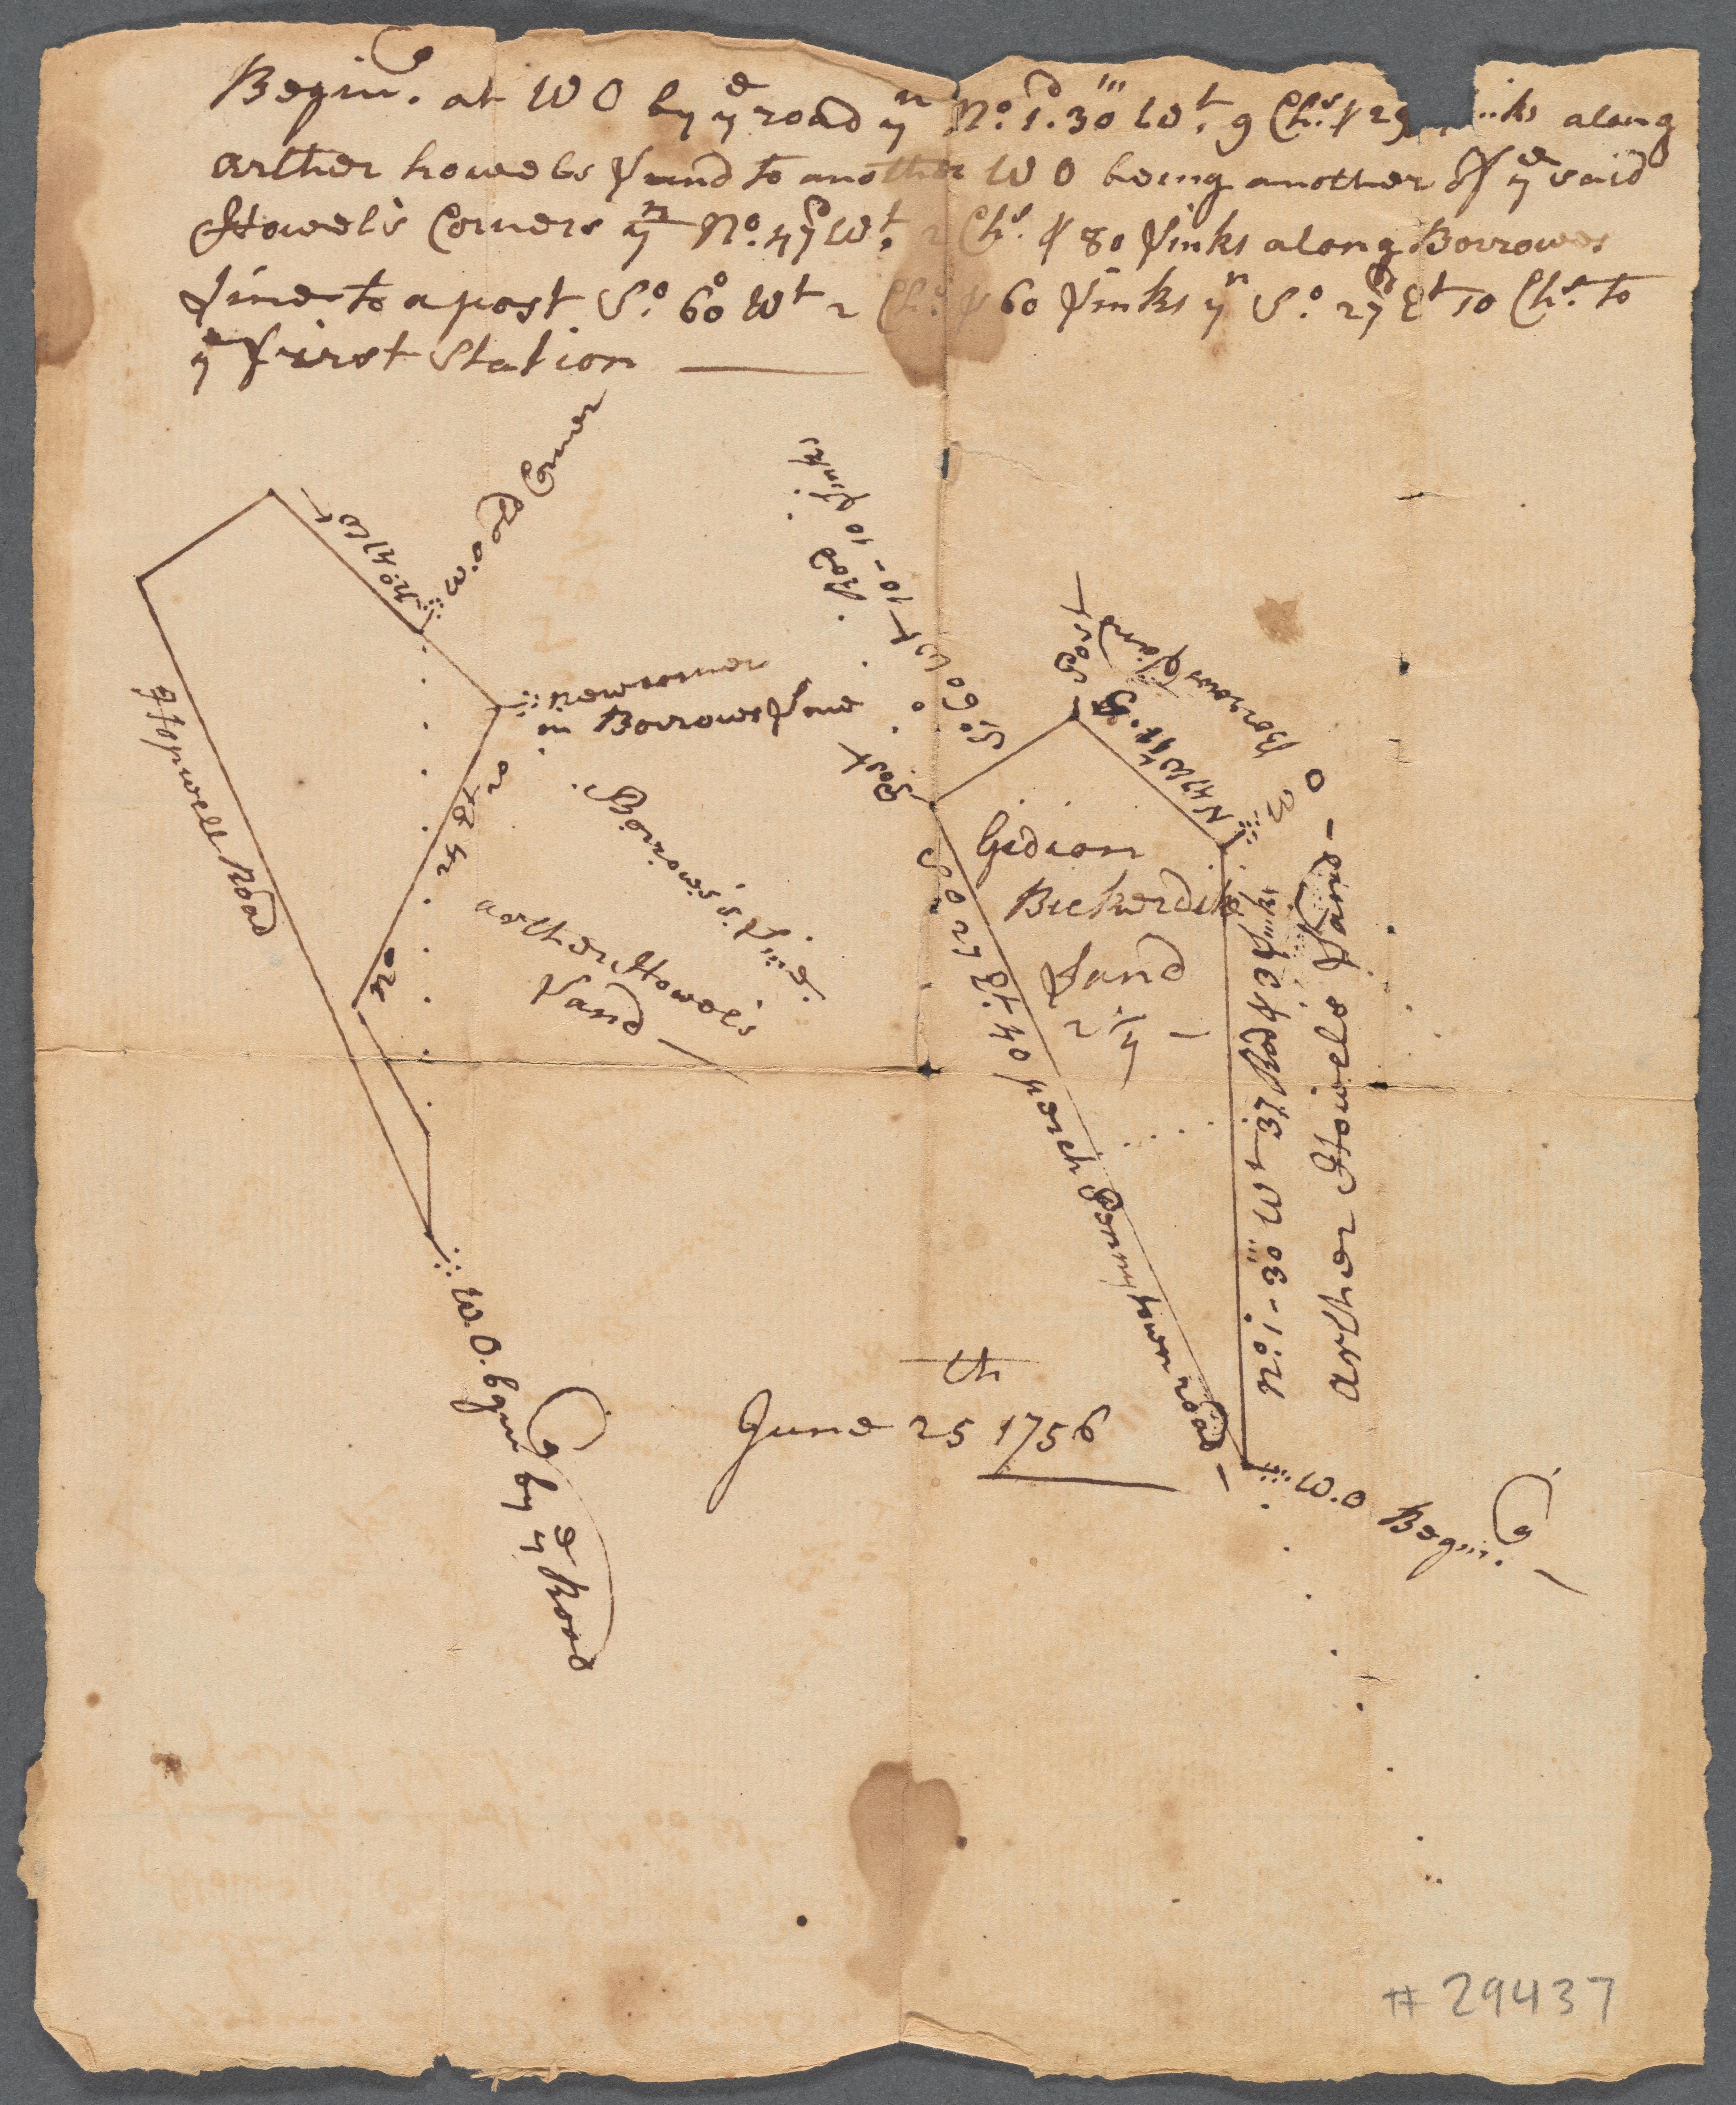 File:Draught of Gidion's Bickerdike lott (along Hopewell